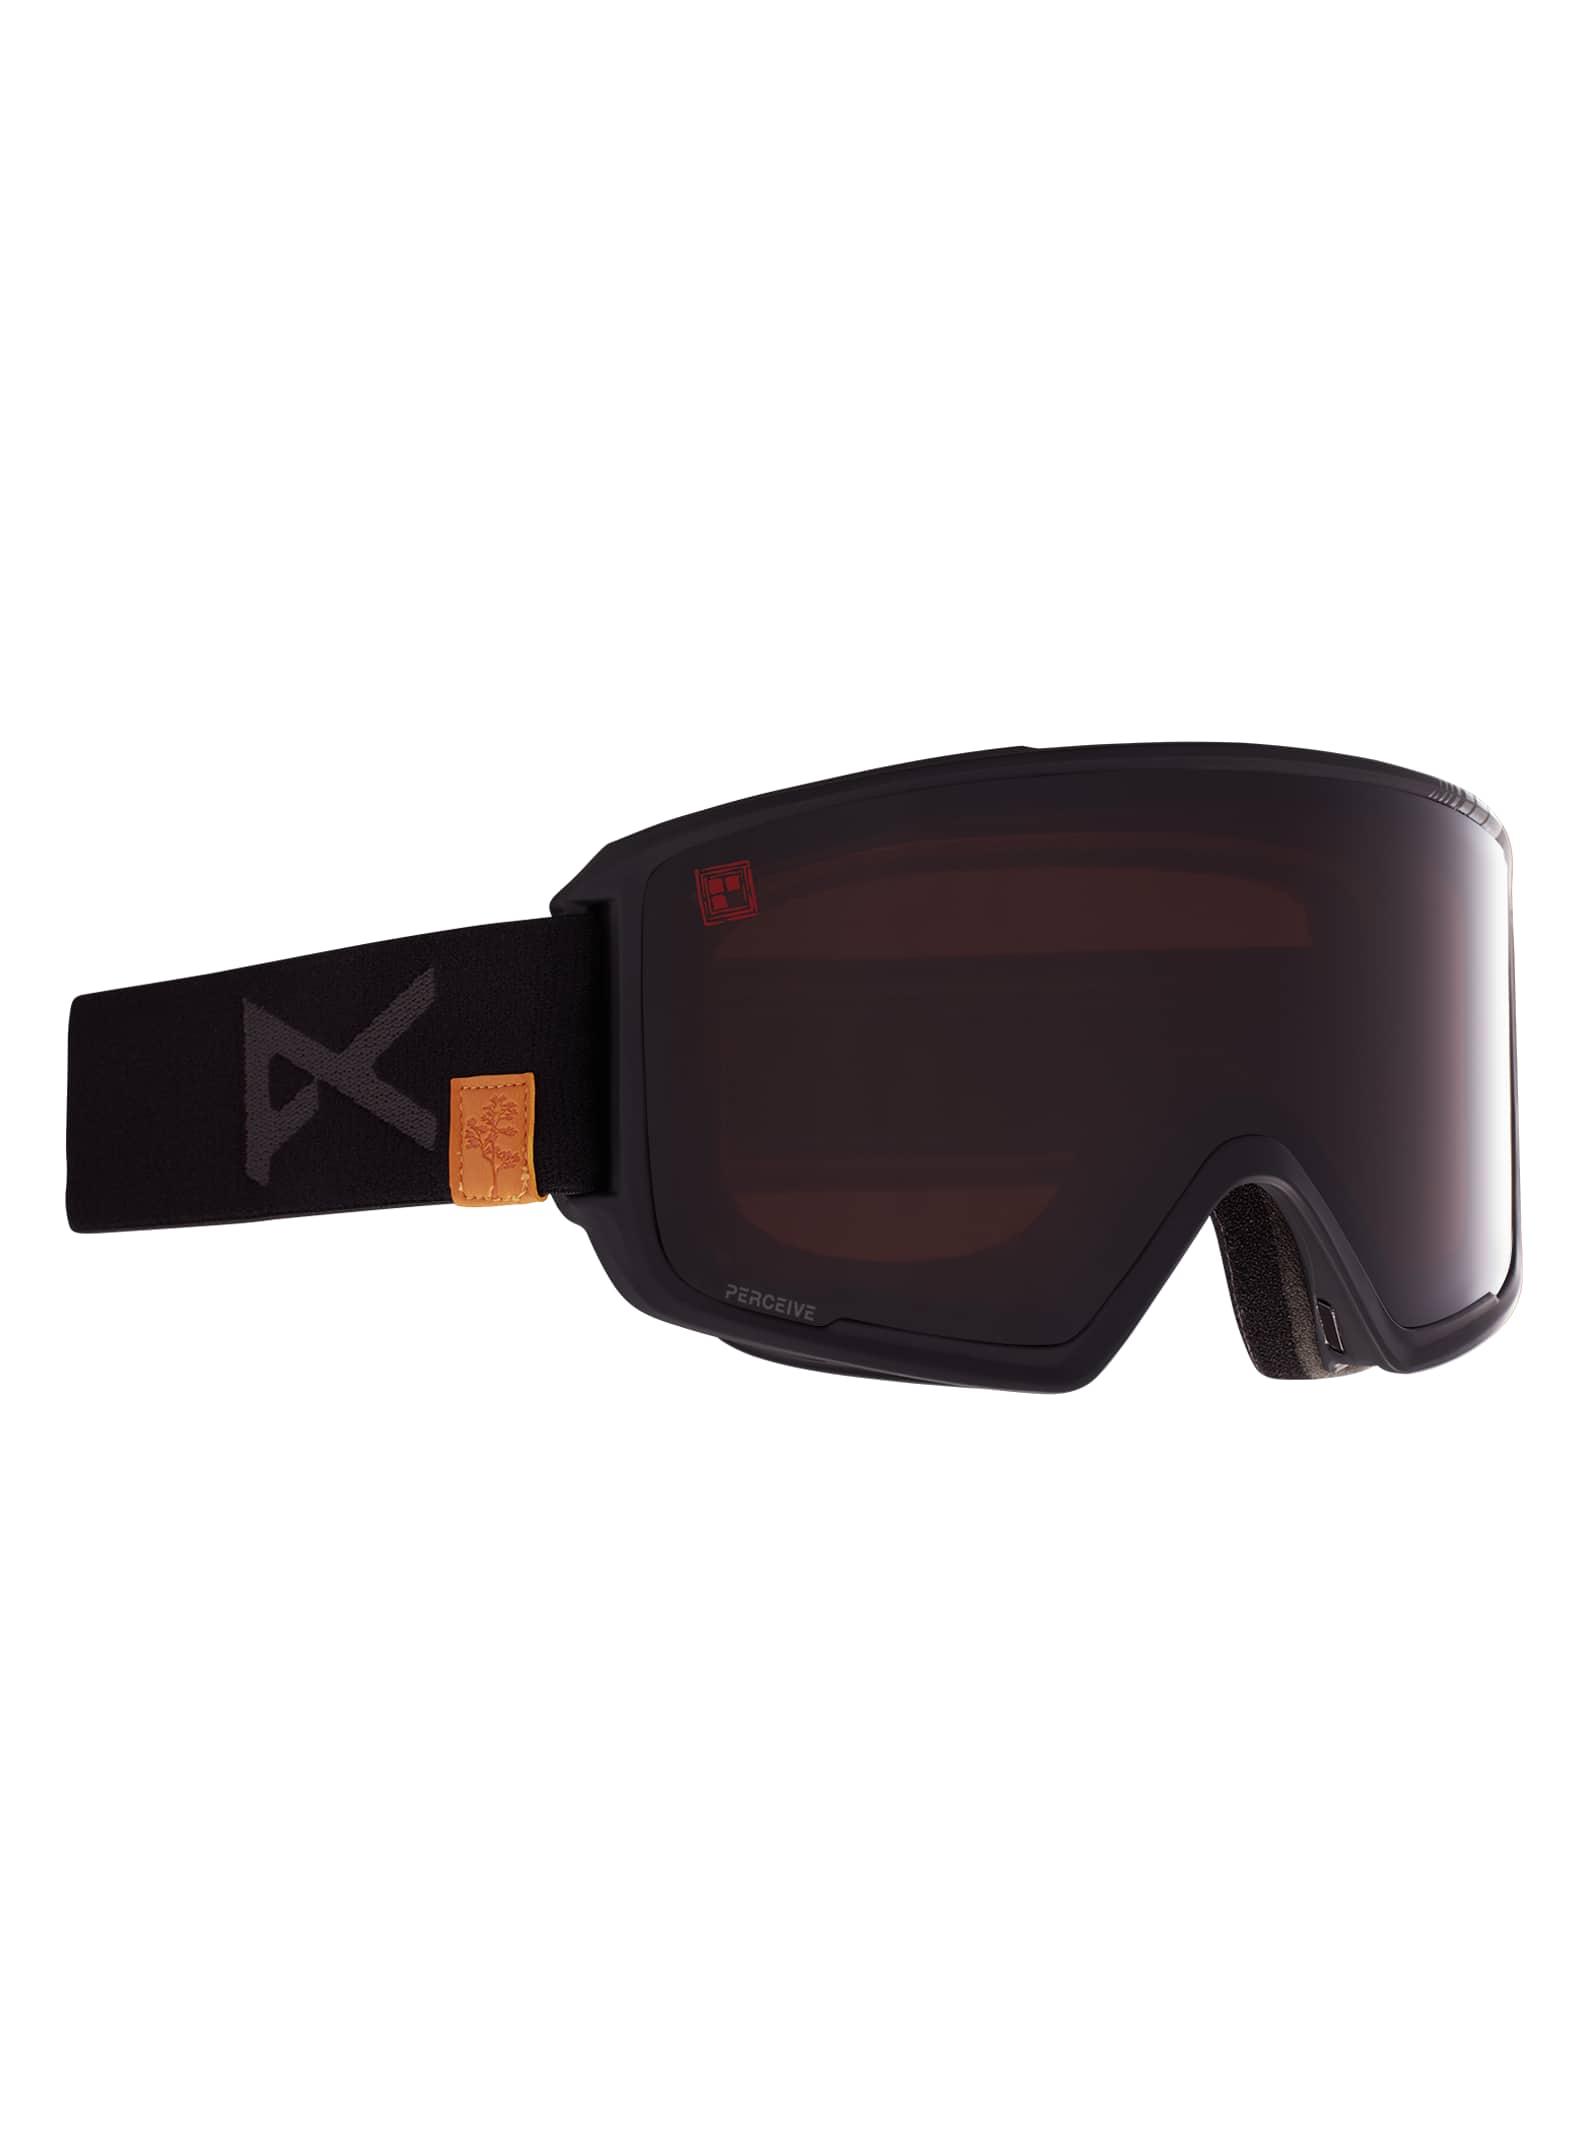 Anon Eric Pollard M3 skidglasögon + reservlins + MFI® ansiktsskydd för herrar